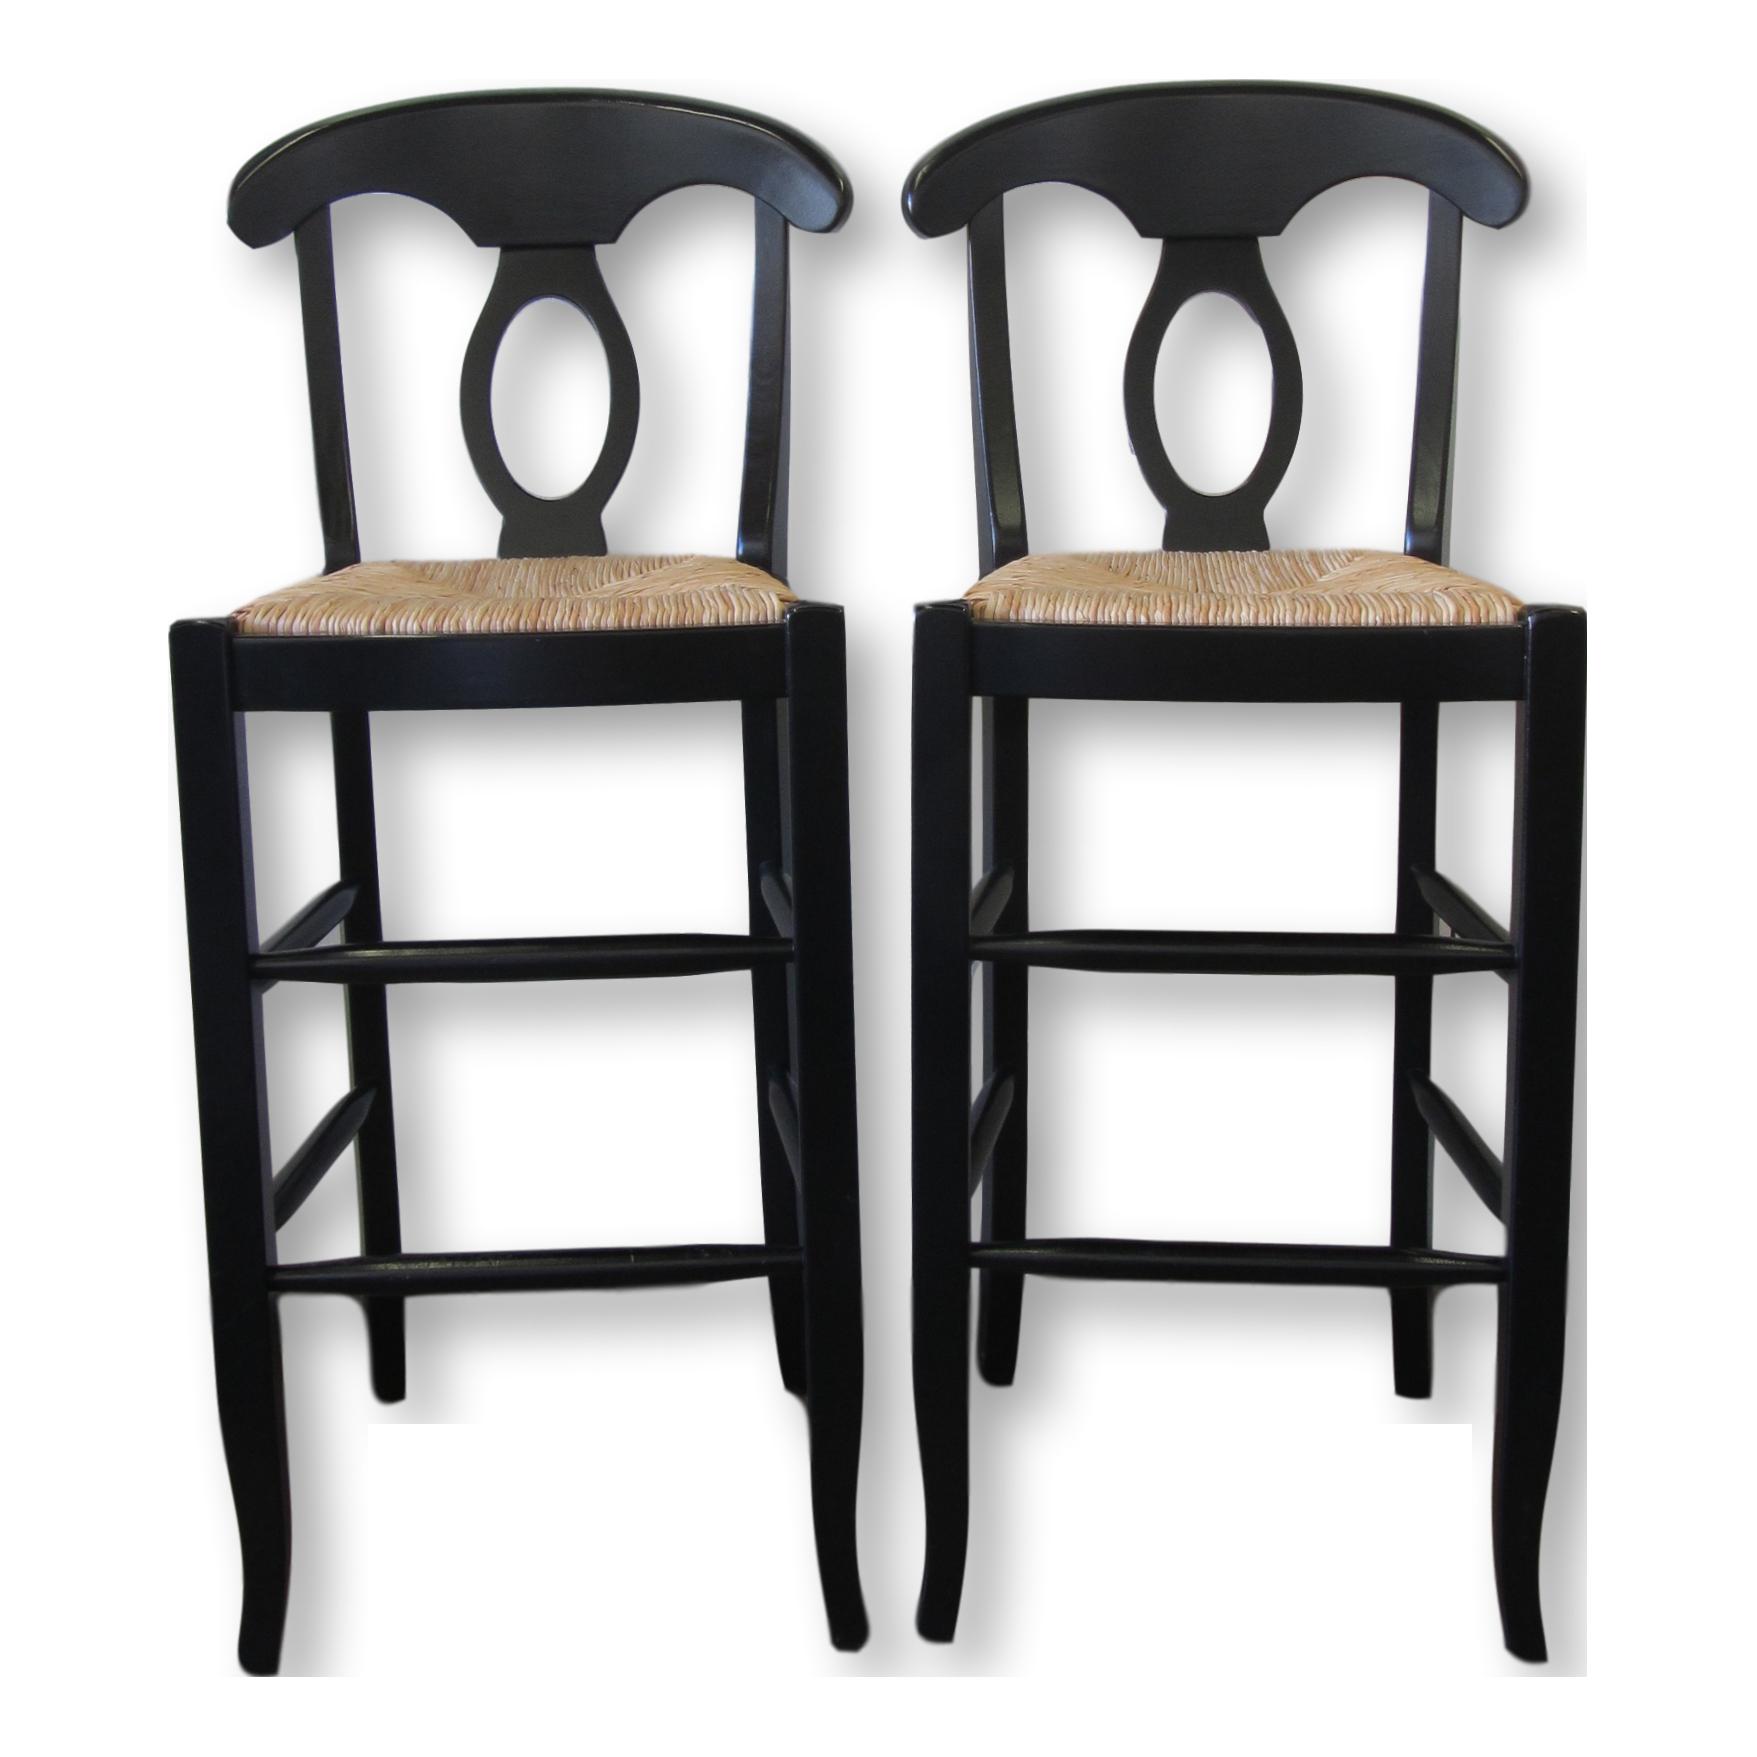 Pottery Barn Black Bar Stools A Pair Chairish